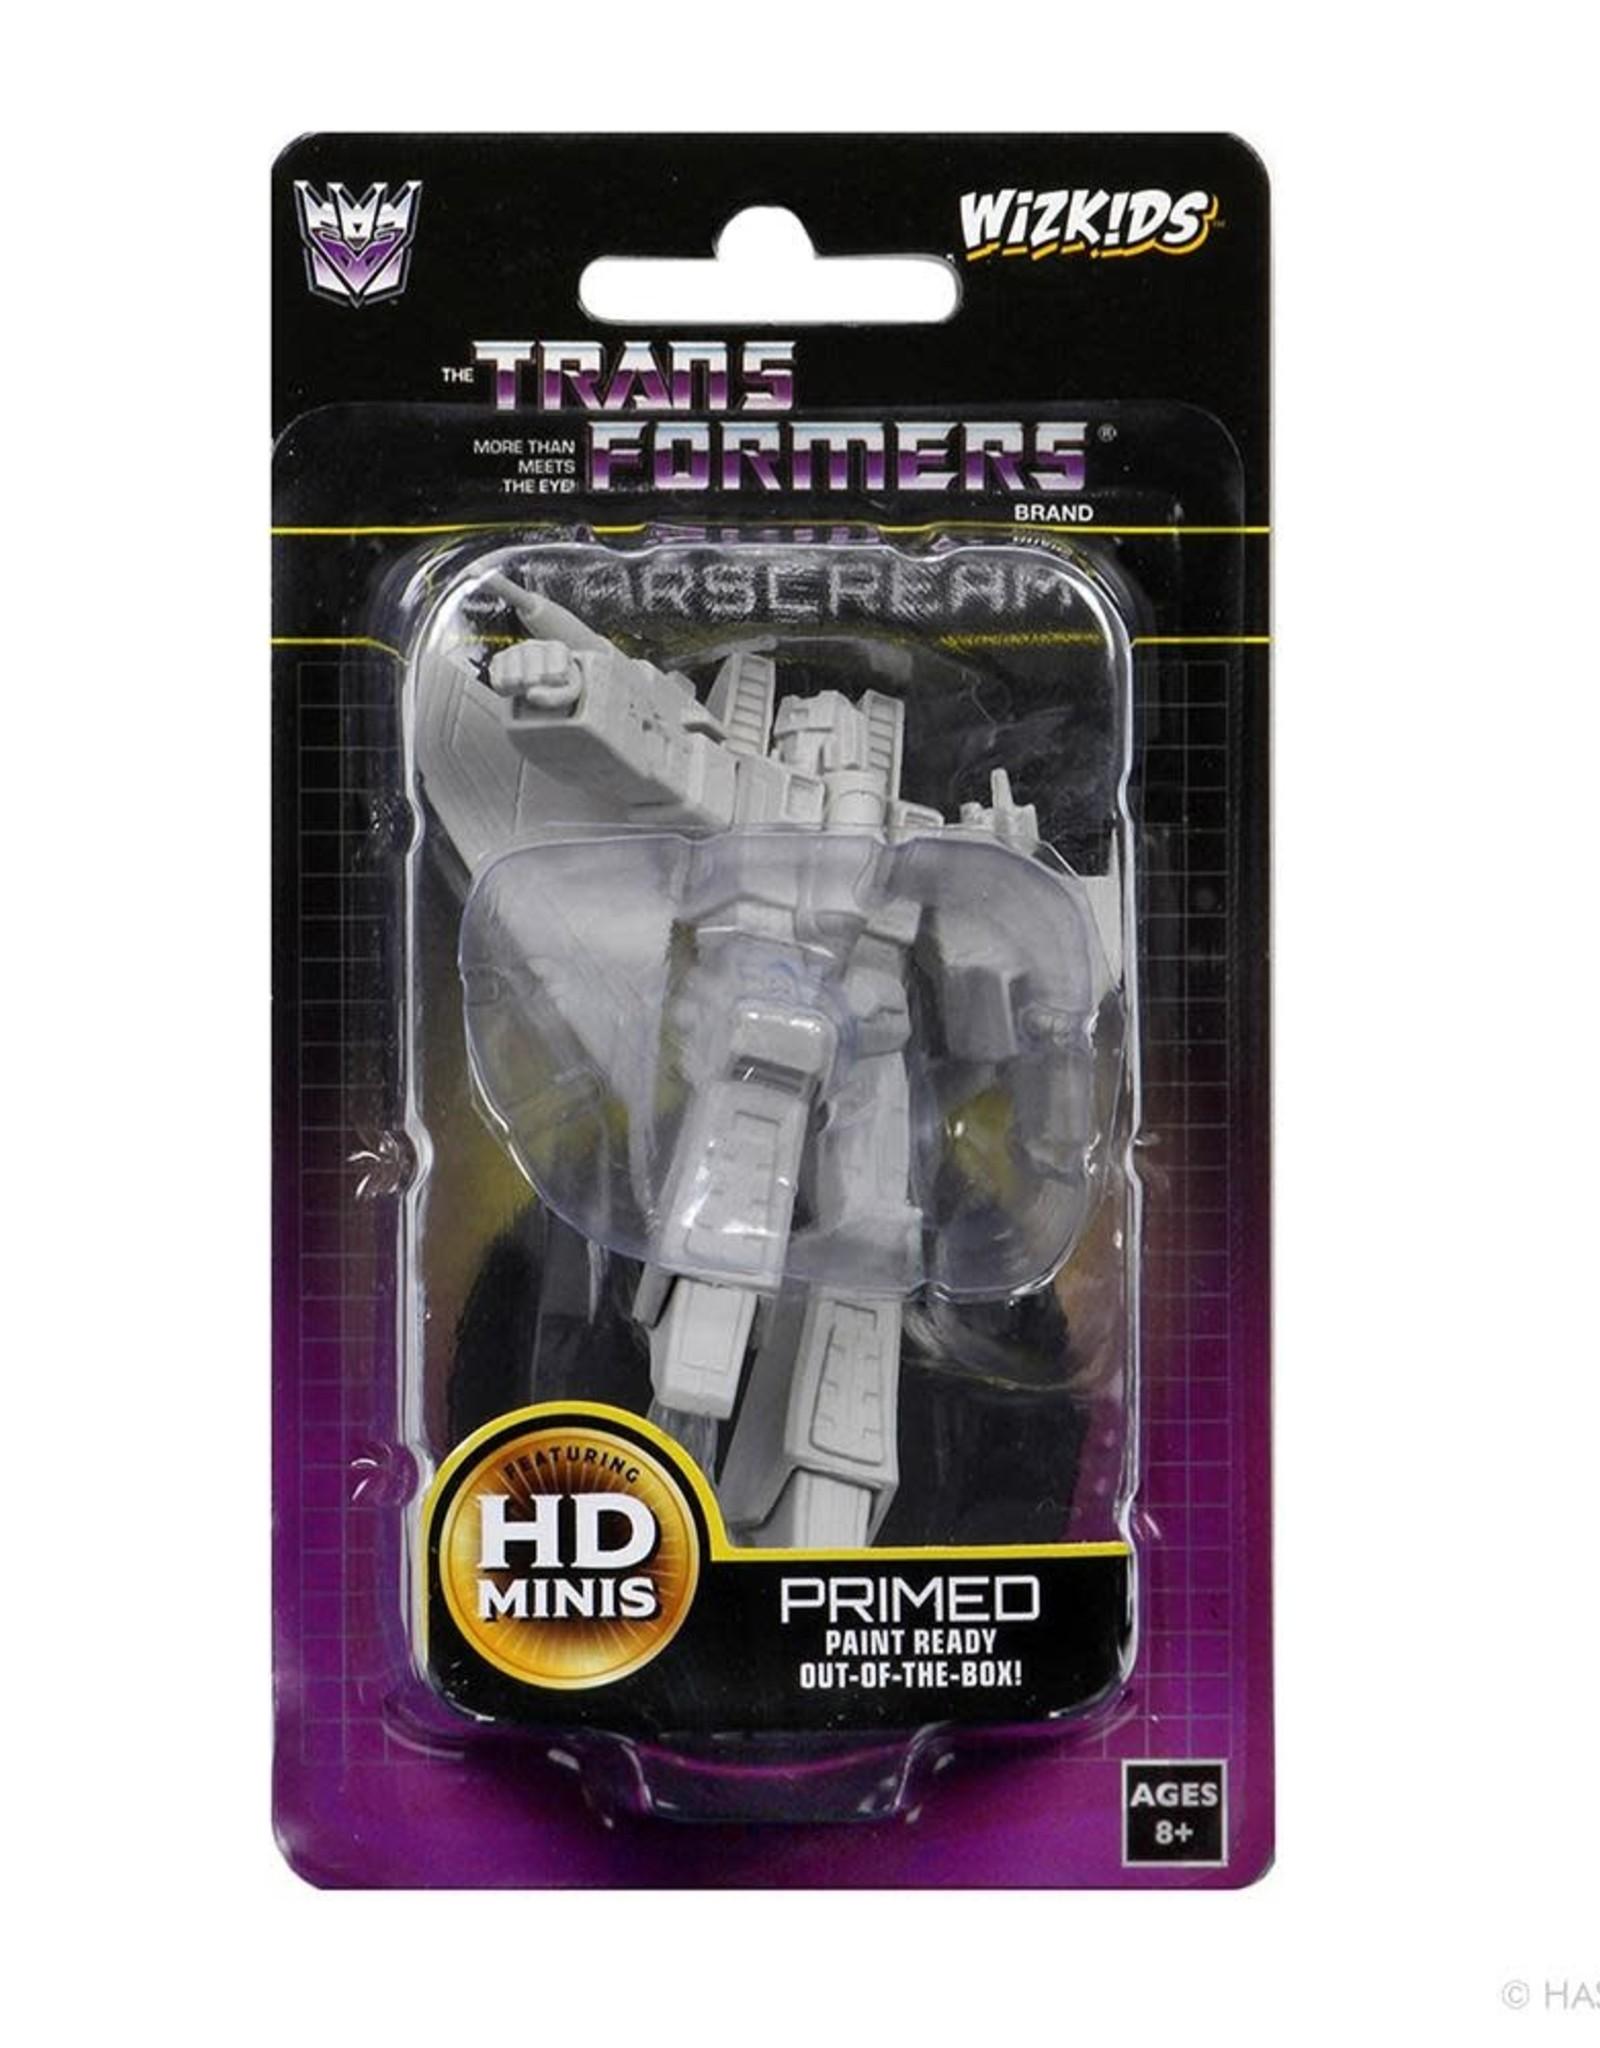 Wizkids Transformers Unpainted Minis: Starscream